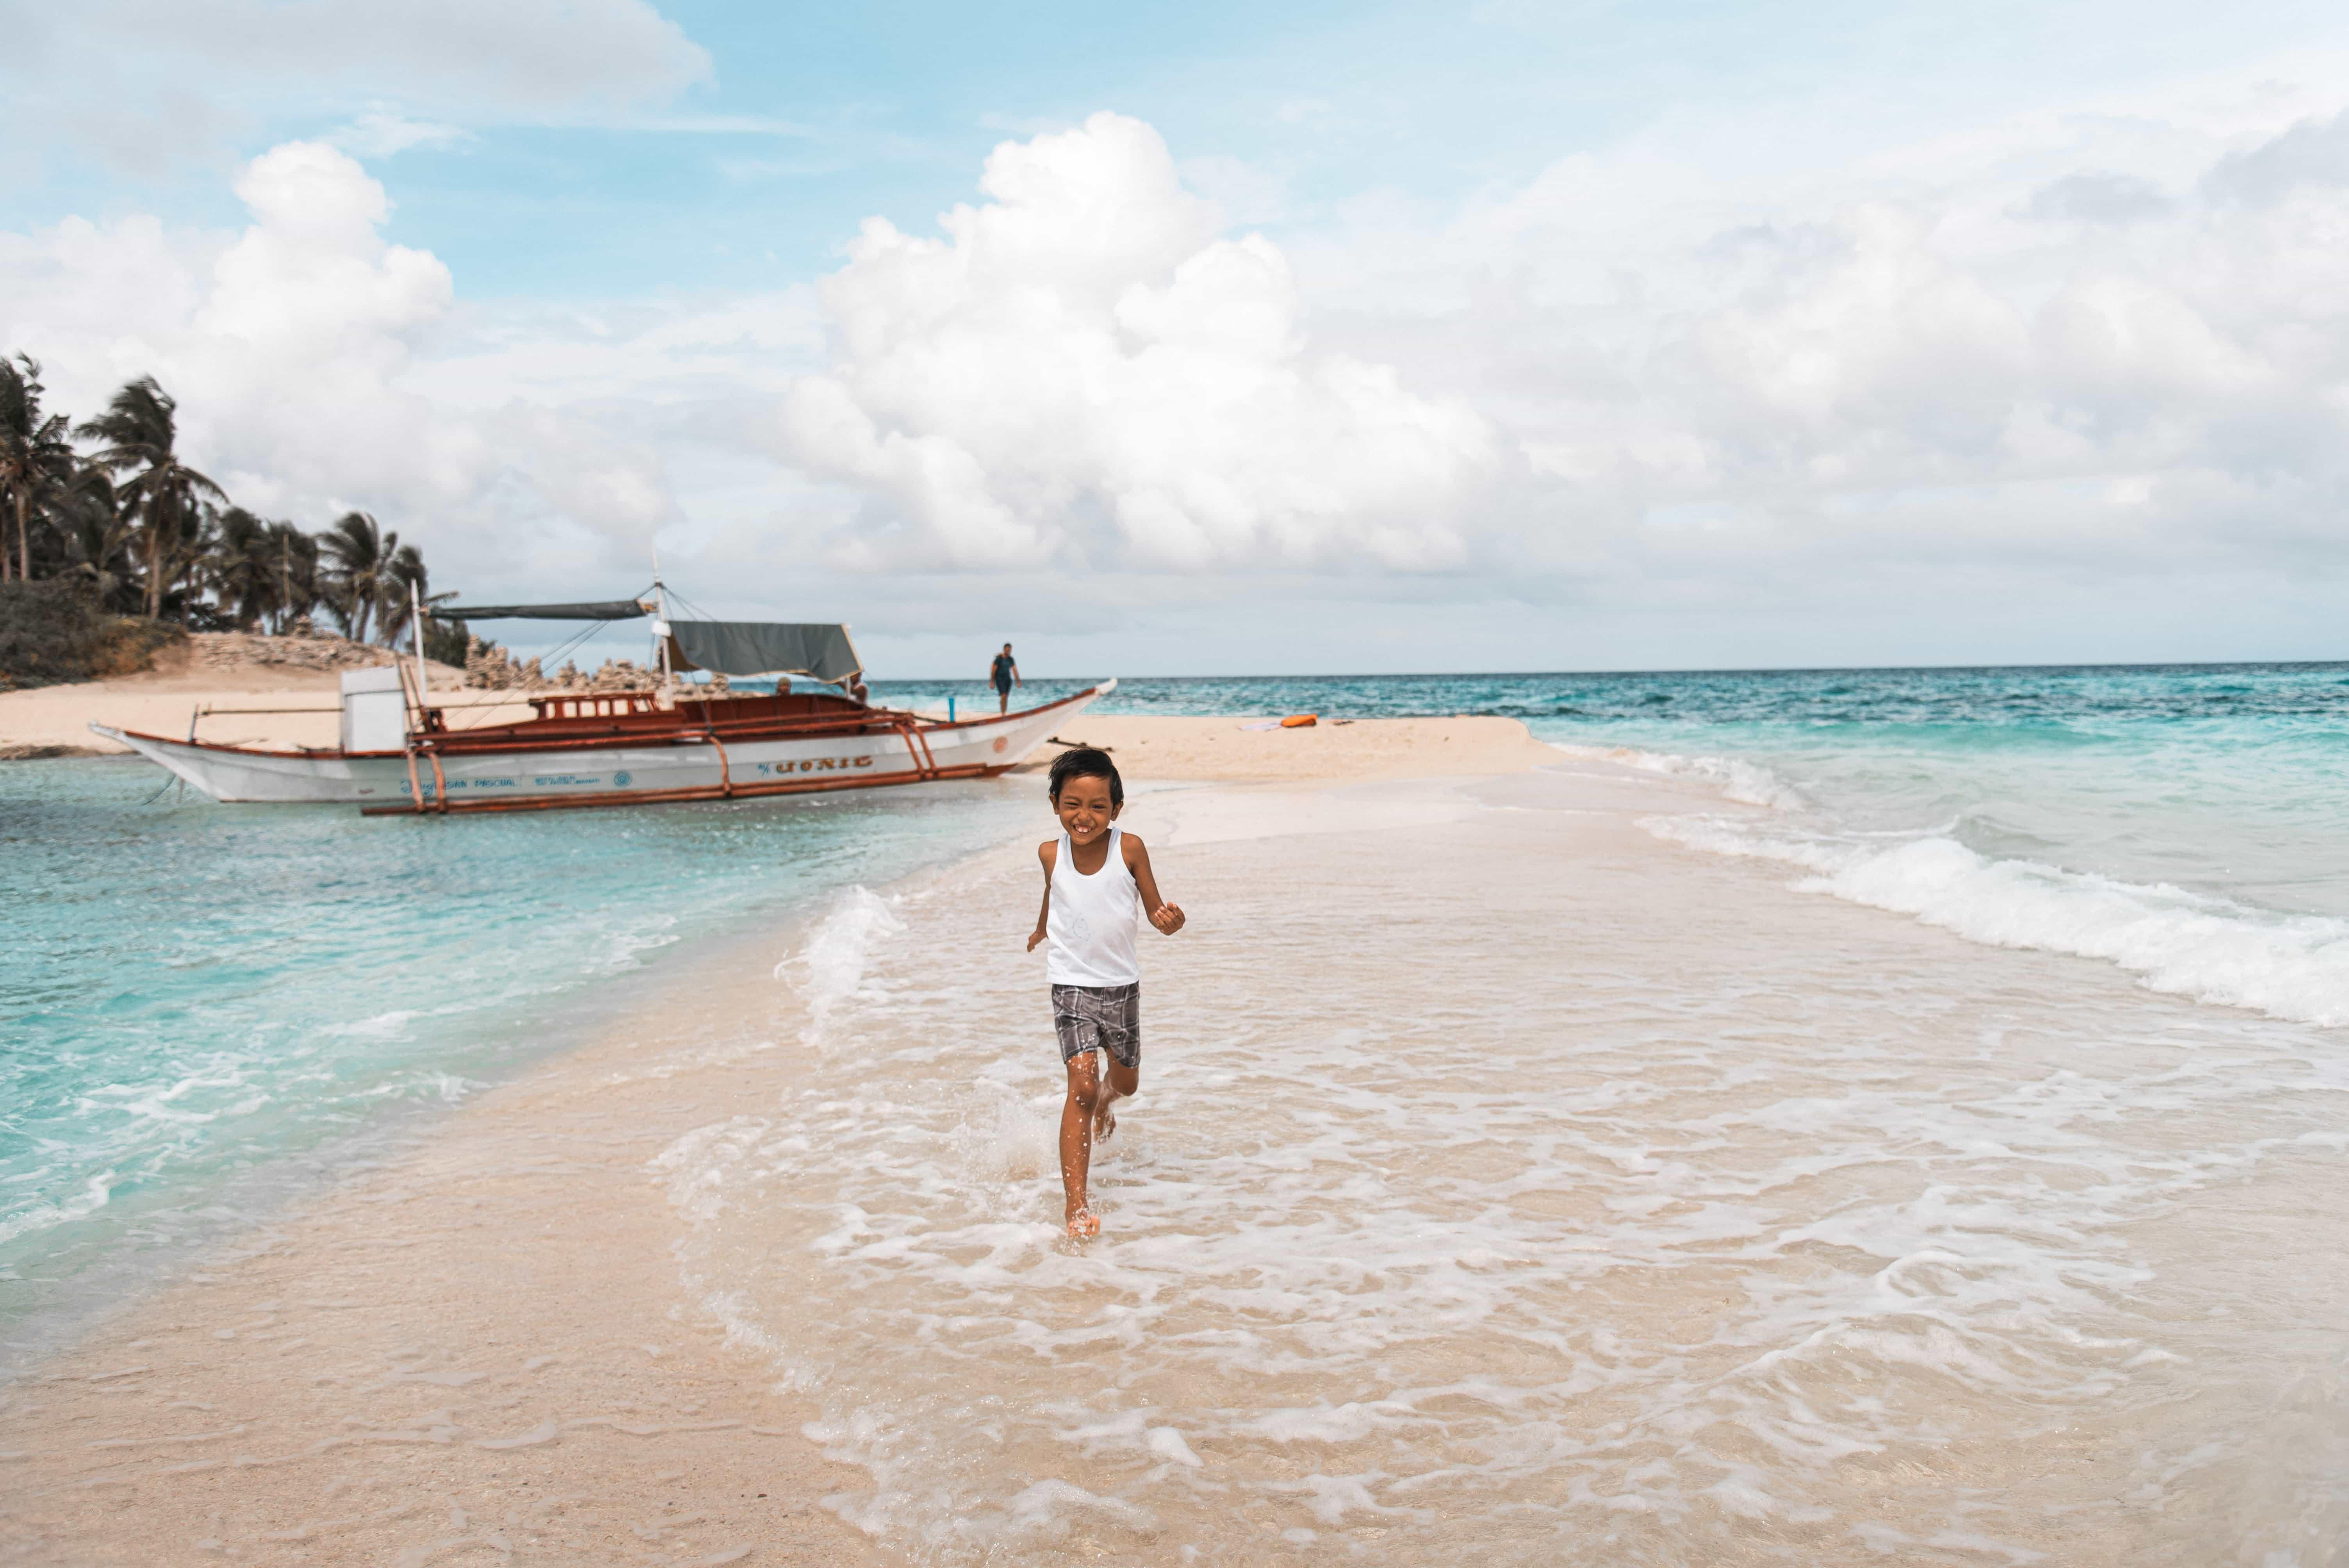 Burias Island tour, Burias Island travel guide, Tinalisayan Island